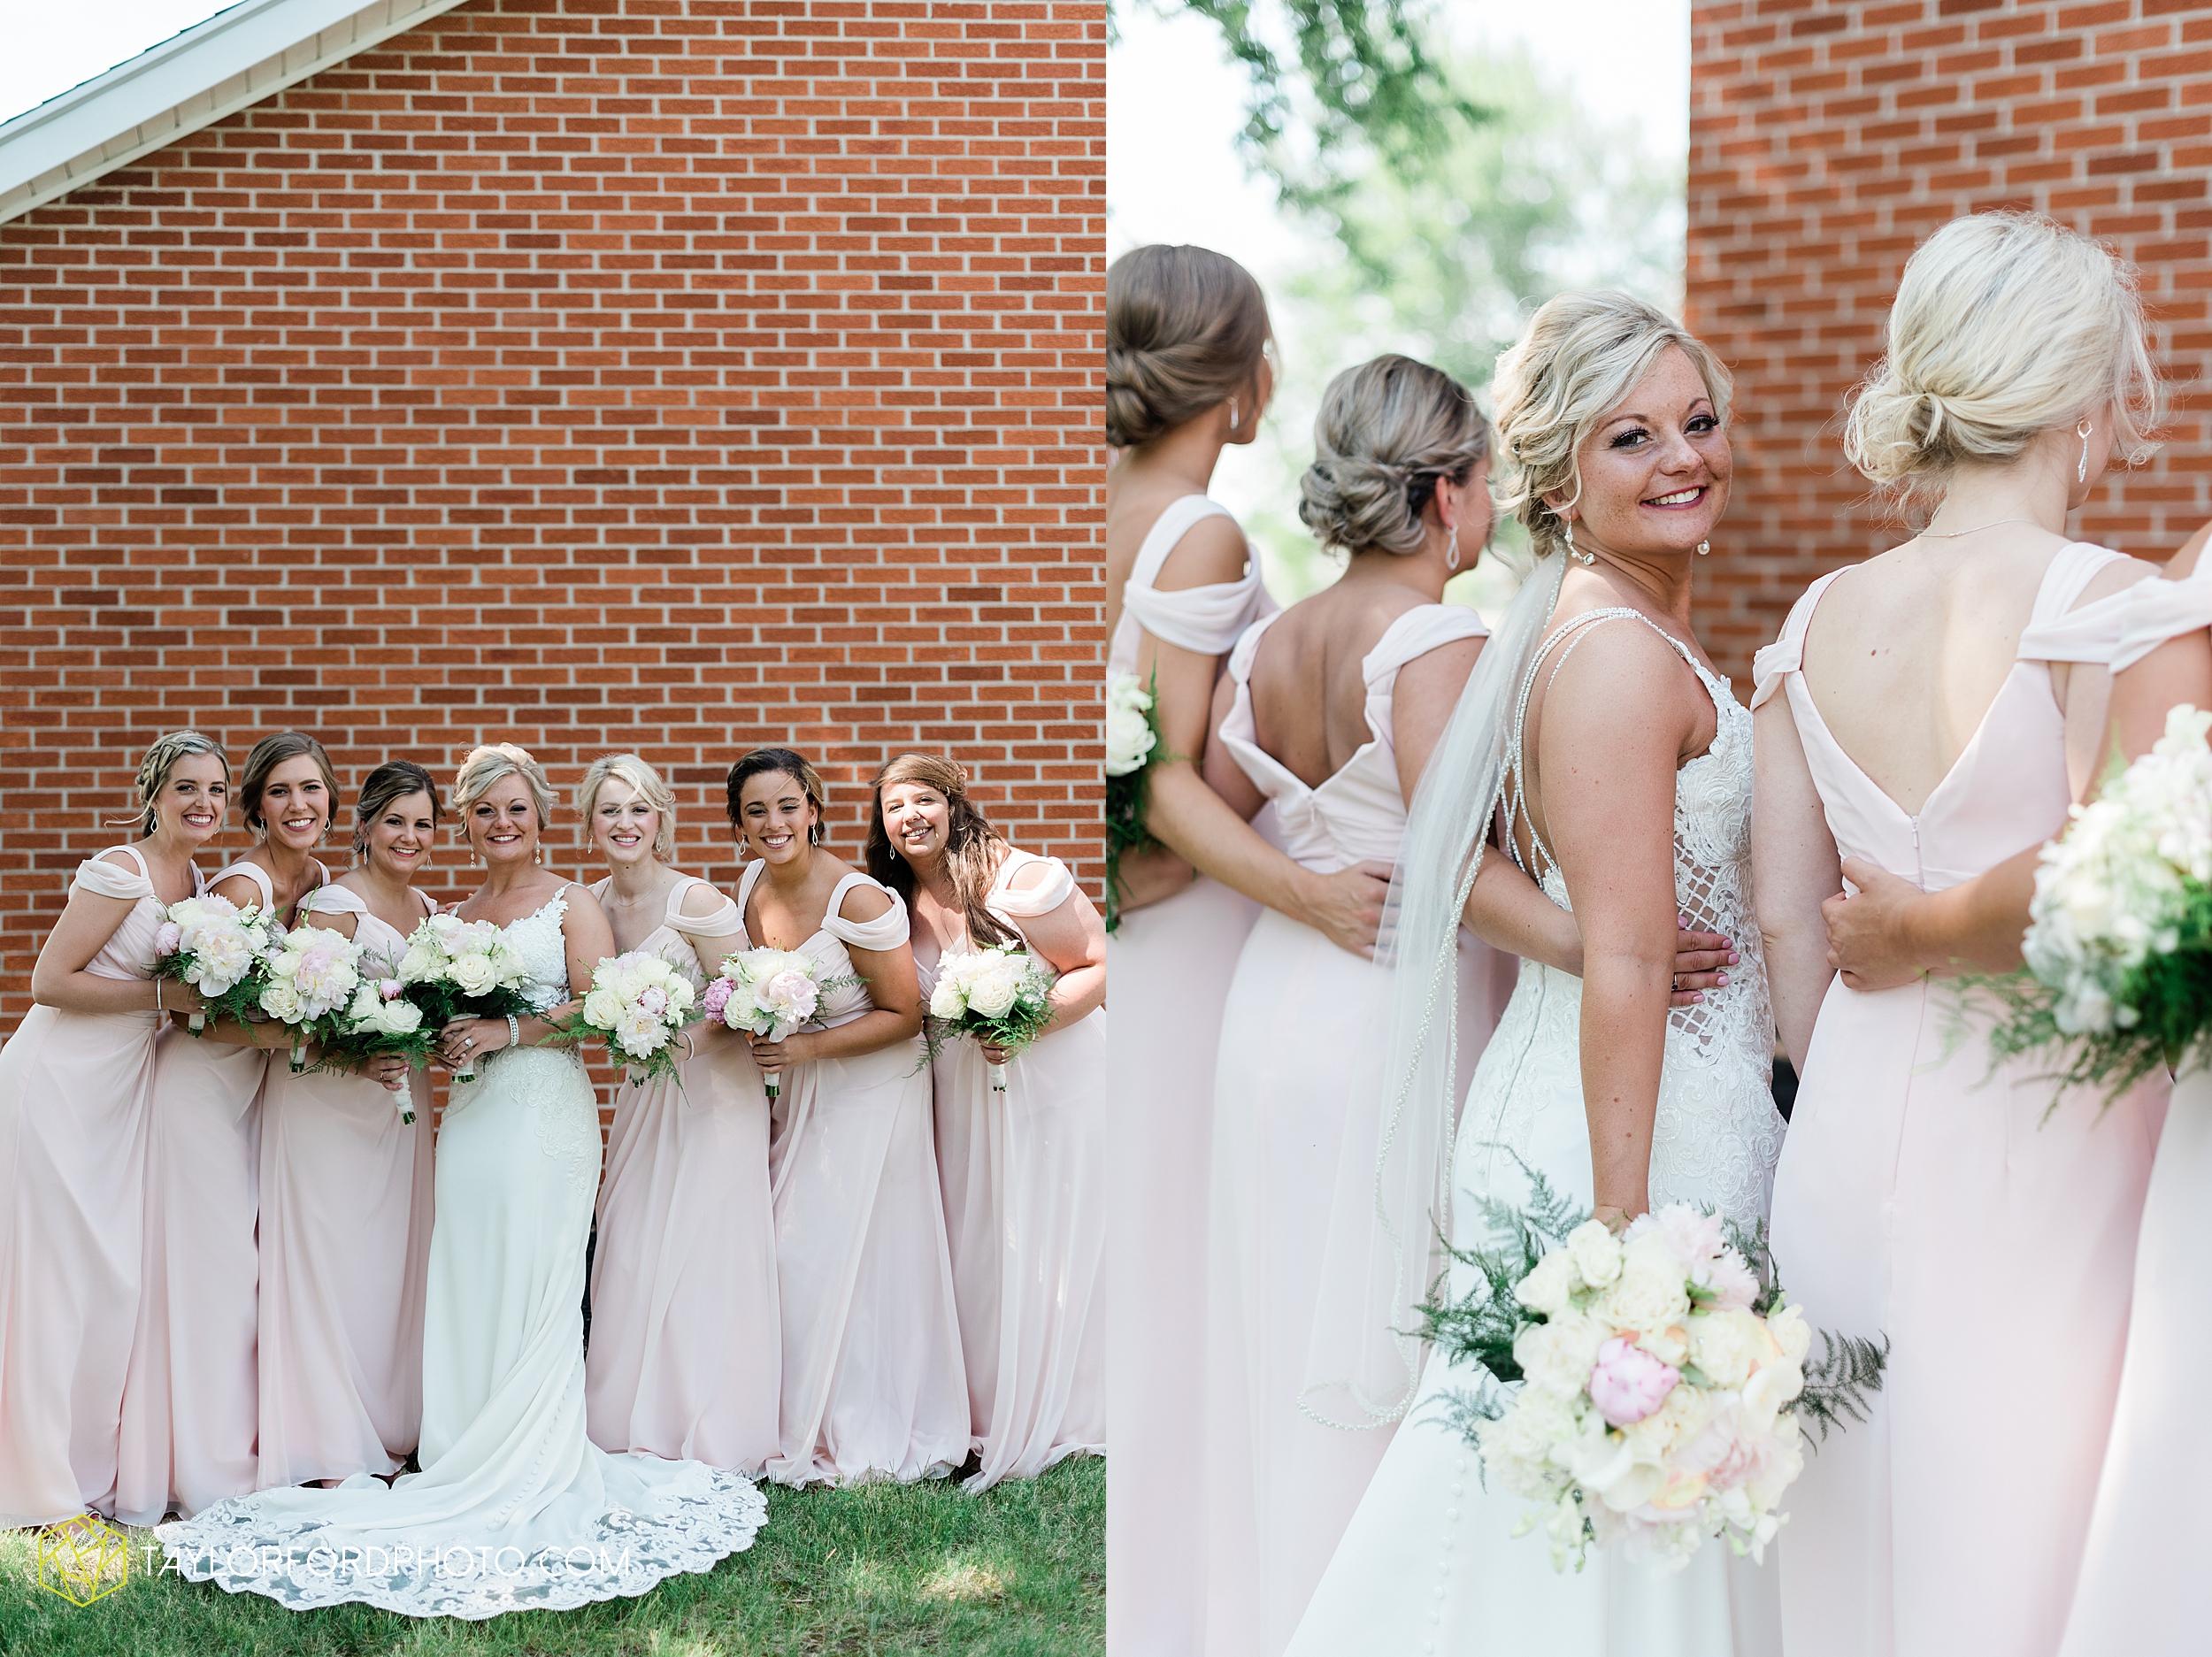 carly-trent-lima-elida-ohio-wedding-the-met-civic-center-reception-immanuel-united-methodist-church-photography-taylor-ford-hirschy-photographer_3354.jpg